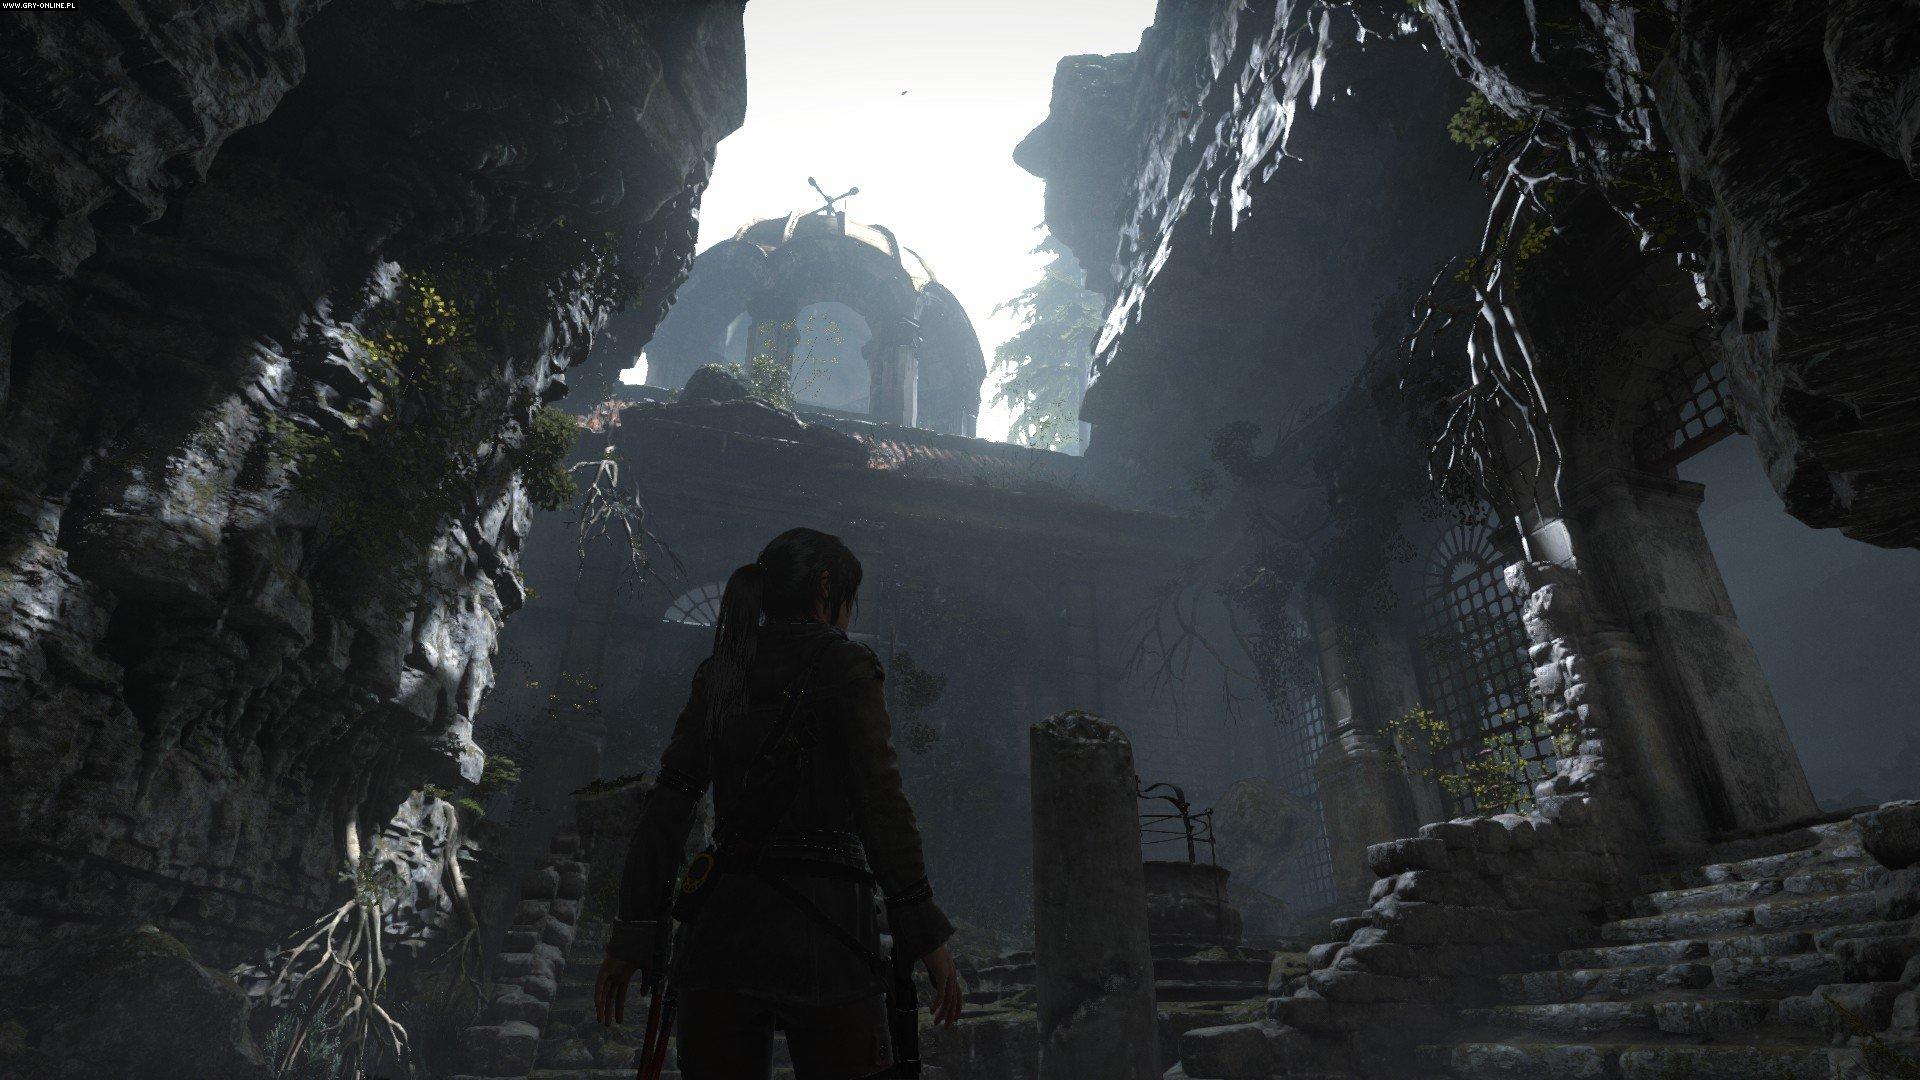 Rise of the Tomb Raider PC, XONE Games Image 43/126, Crystal Dynamics, Square-Enix / Eidos